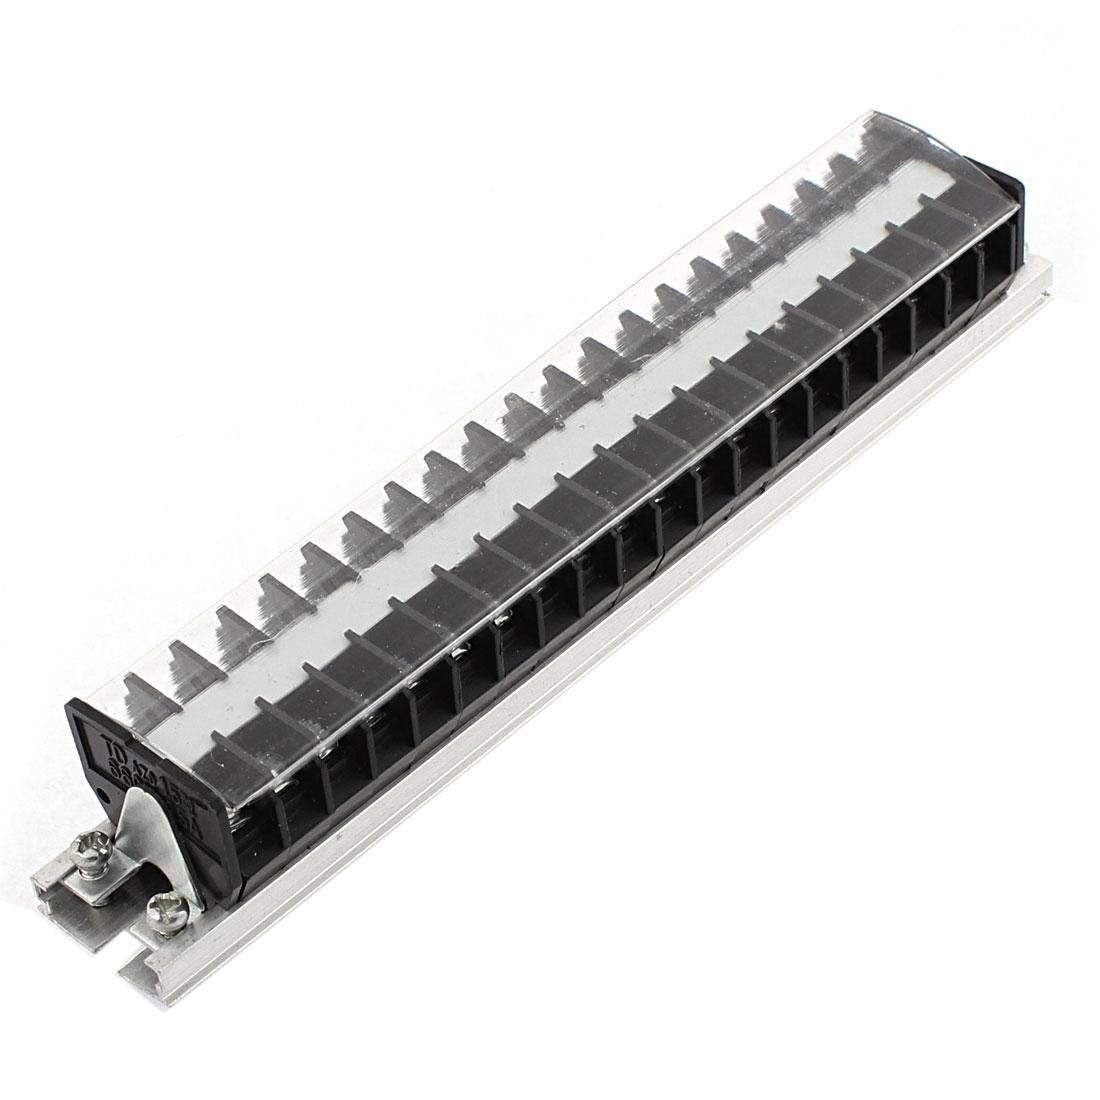 TD-1520 660V 15A Rail Base Dual Row 20 Positions Screw Barrier Terminal Strip